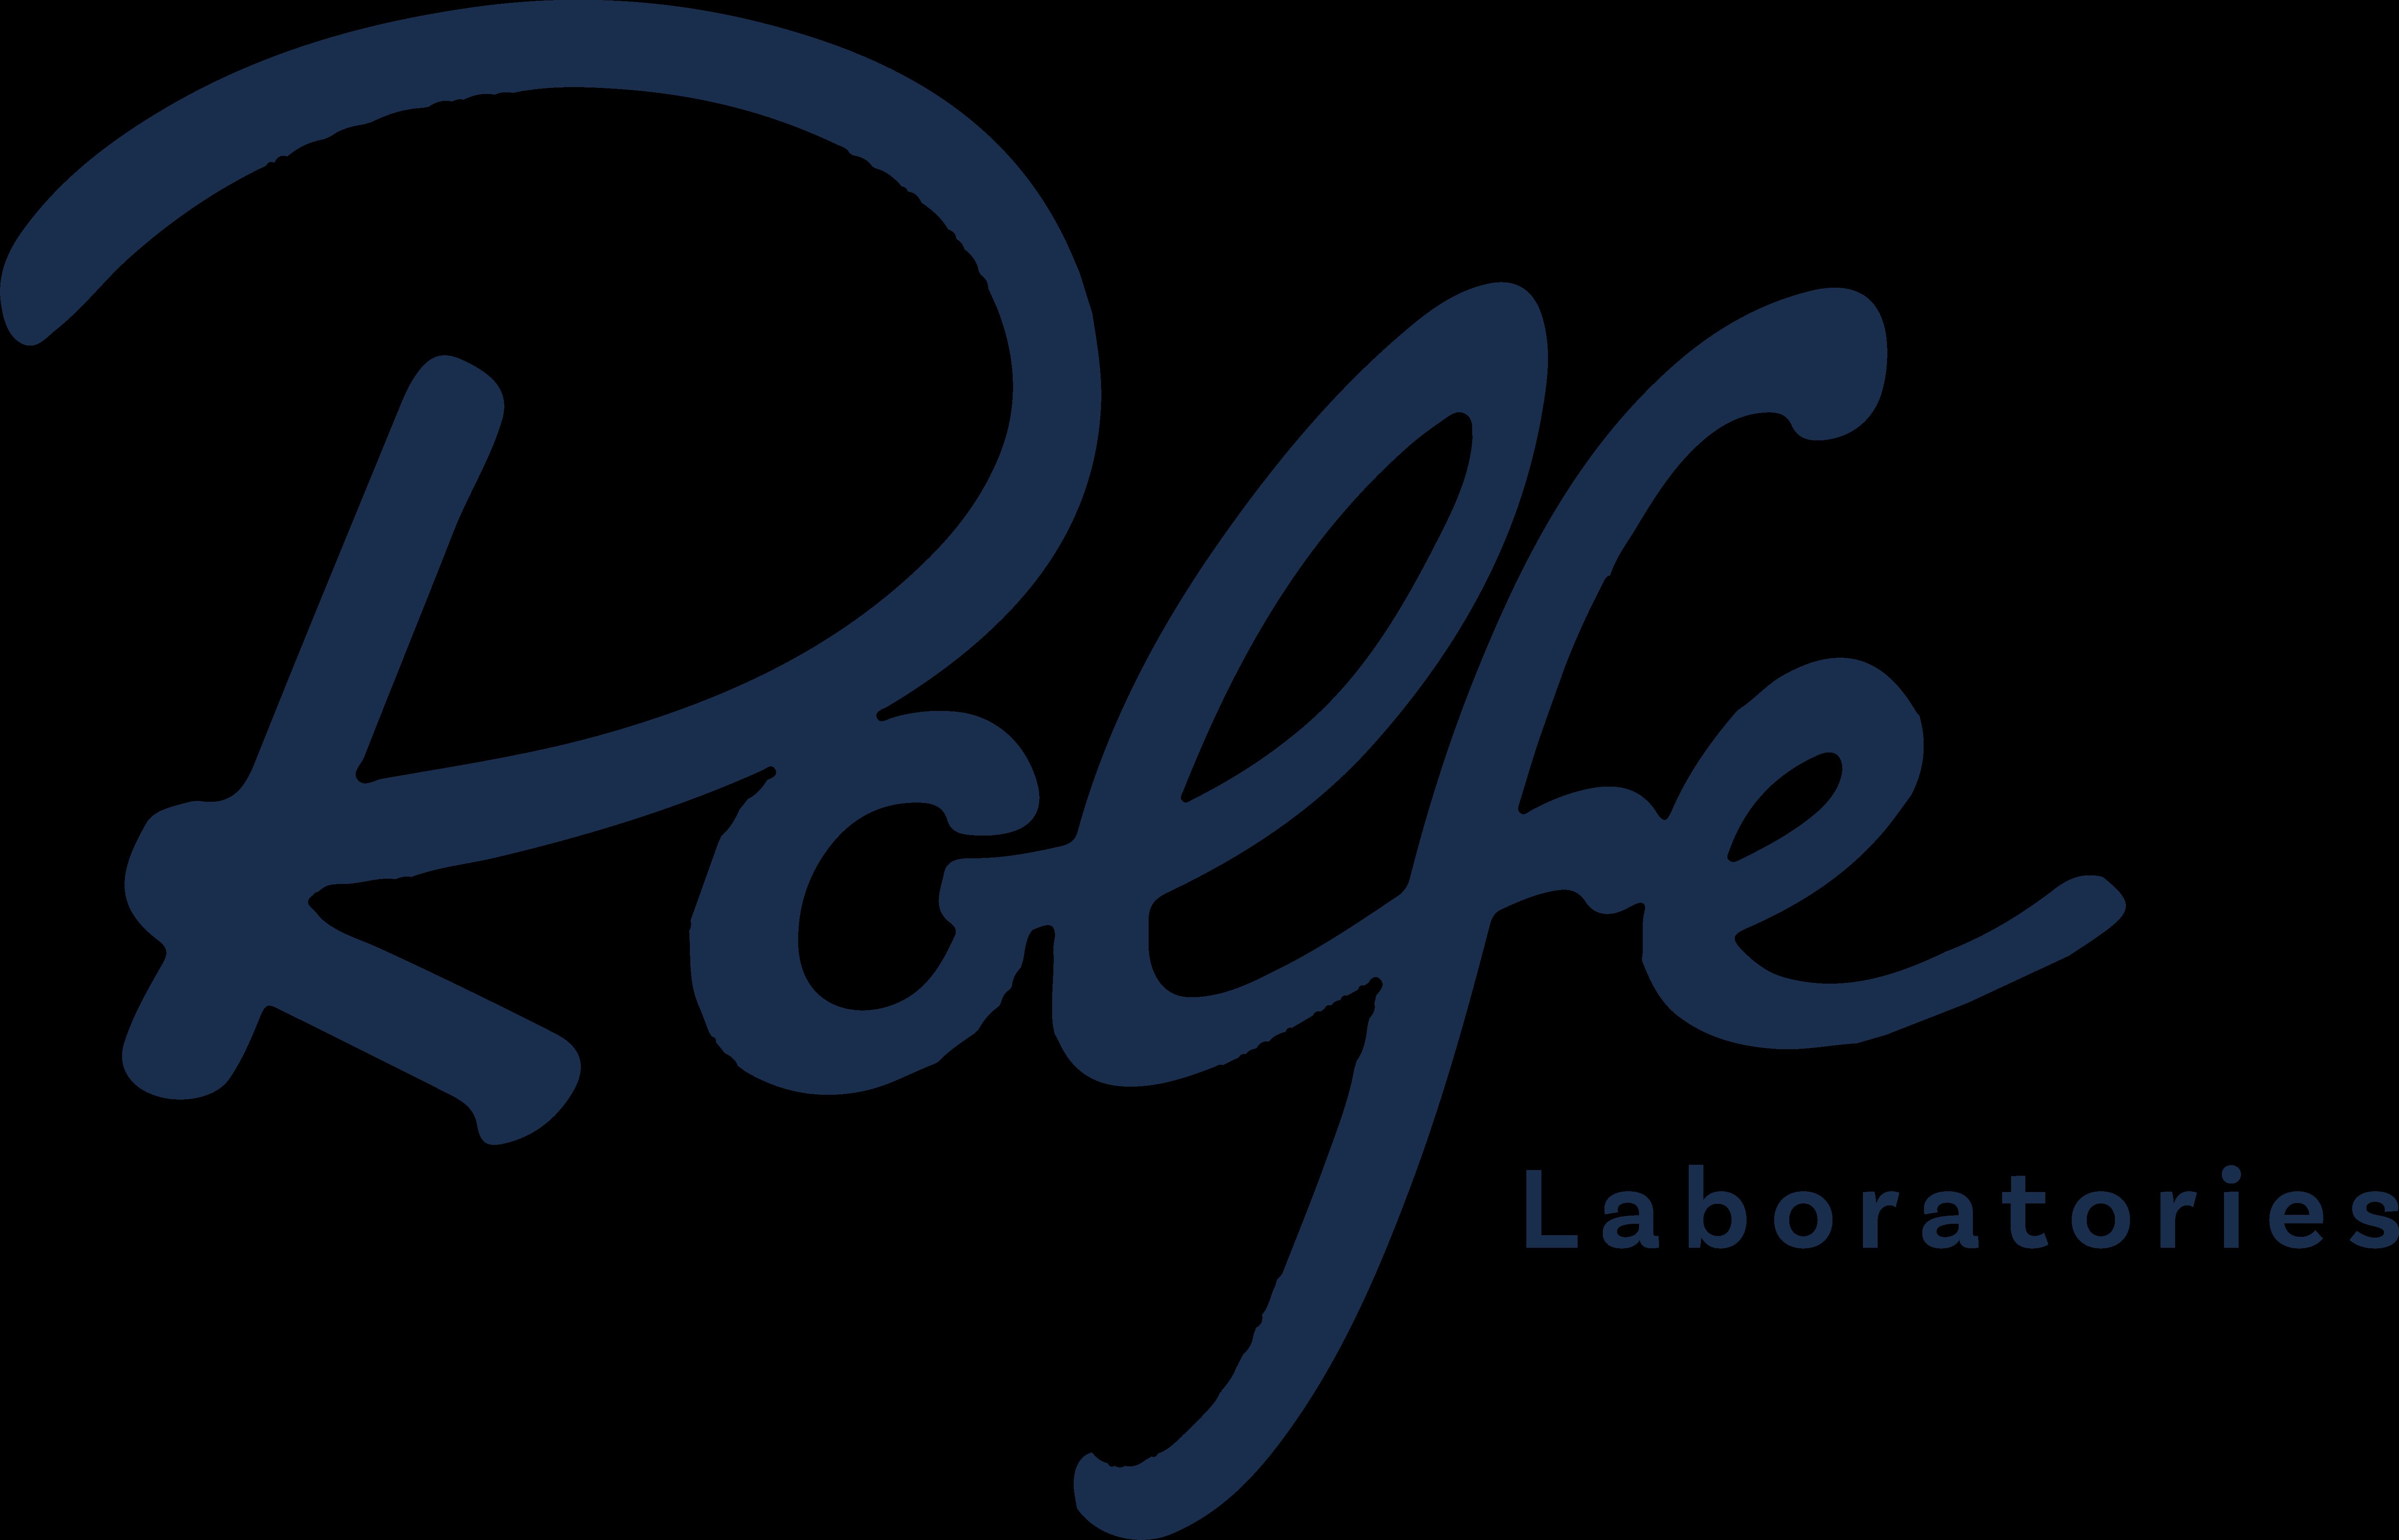 Rolfe Laboratories